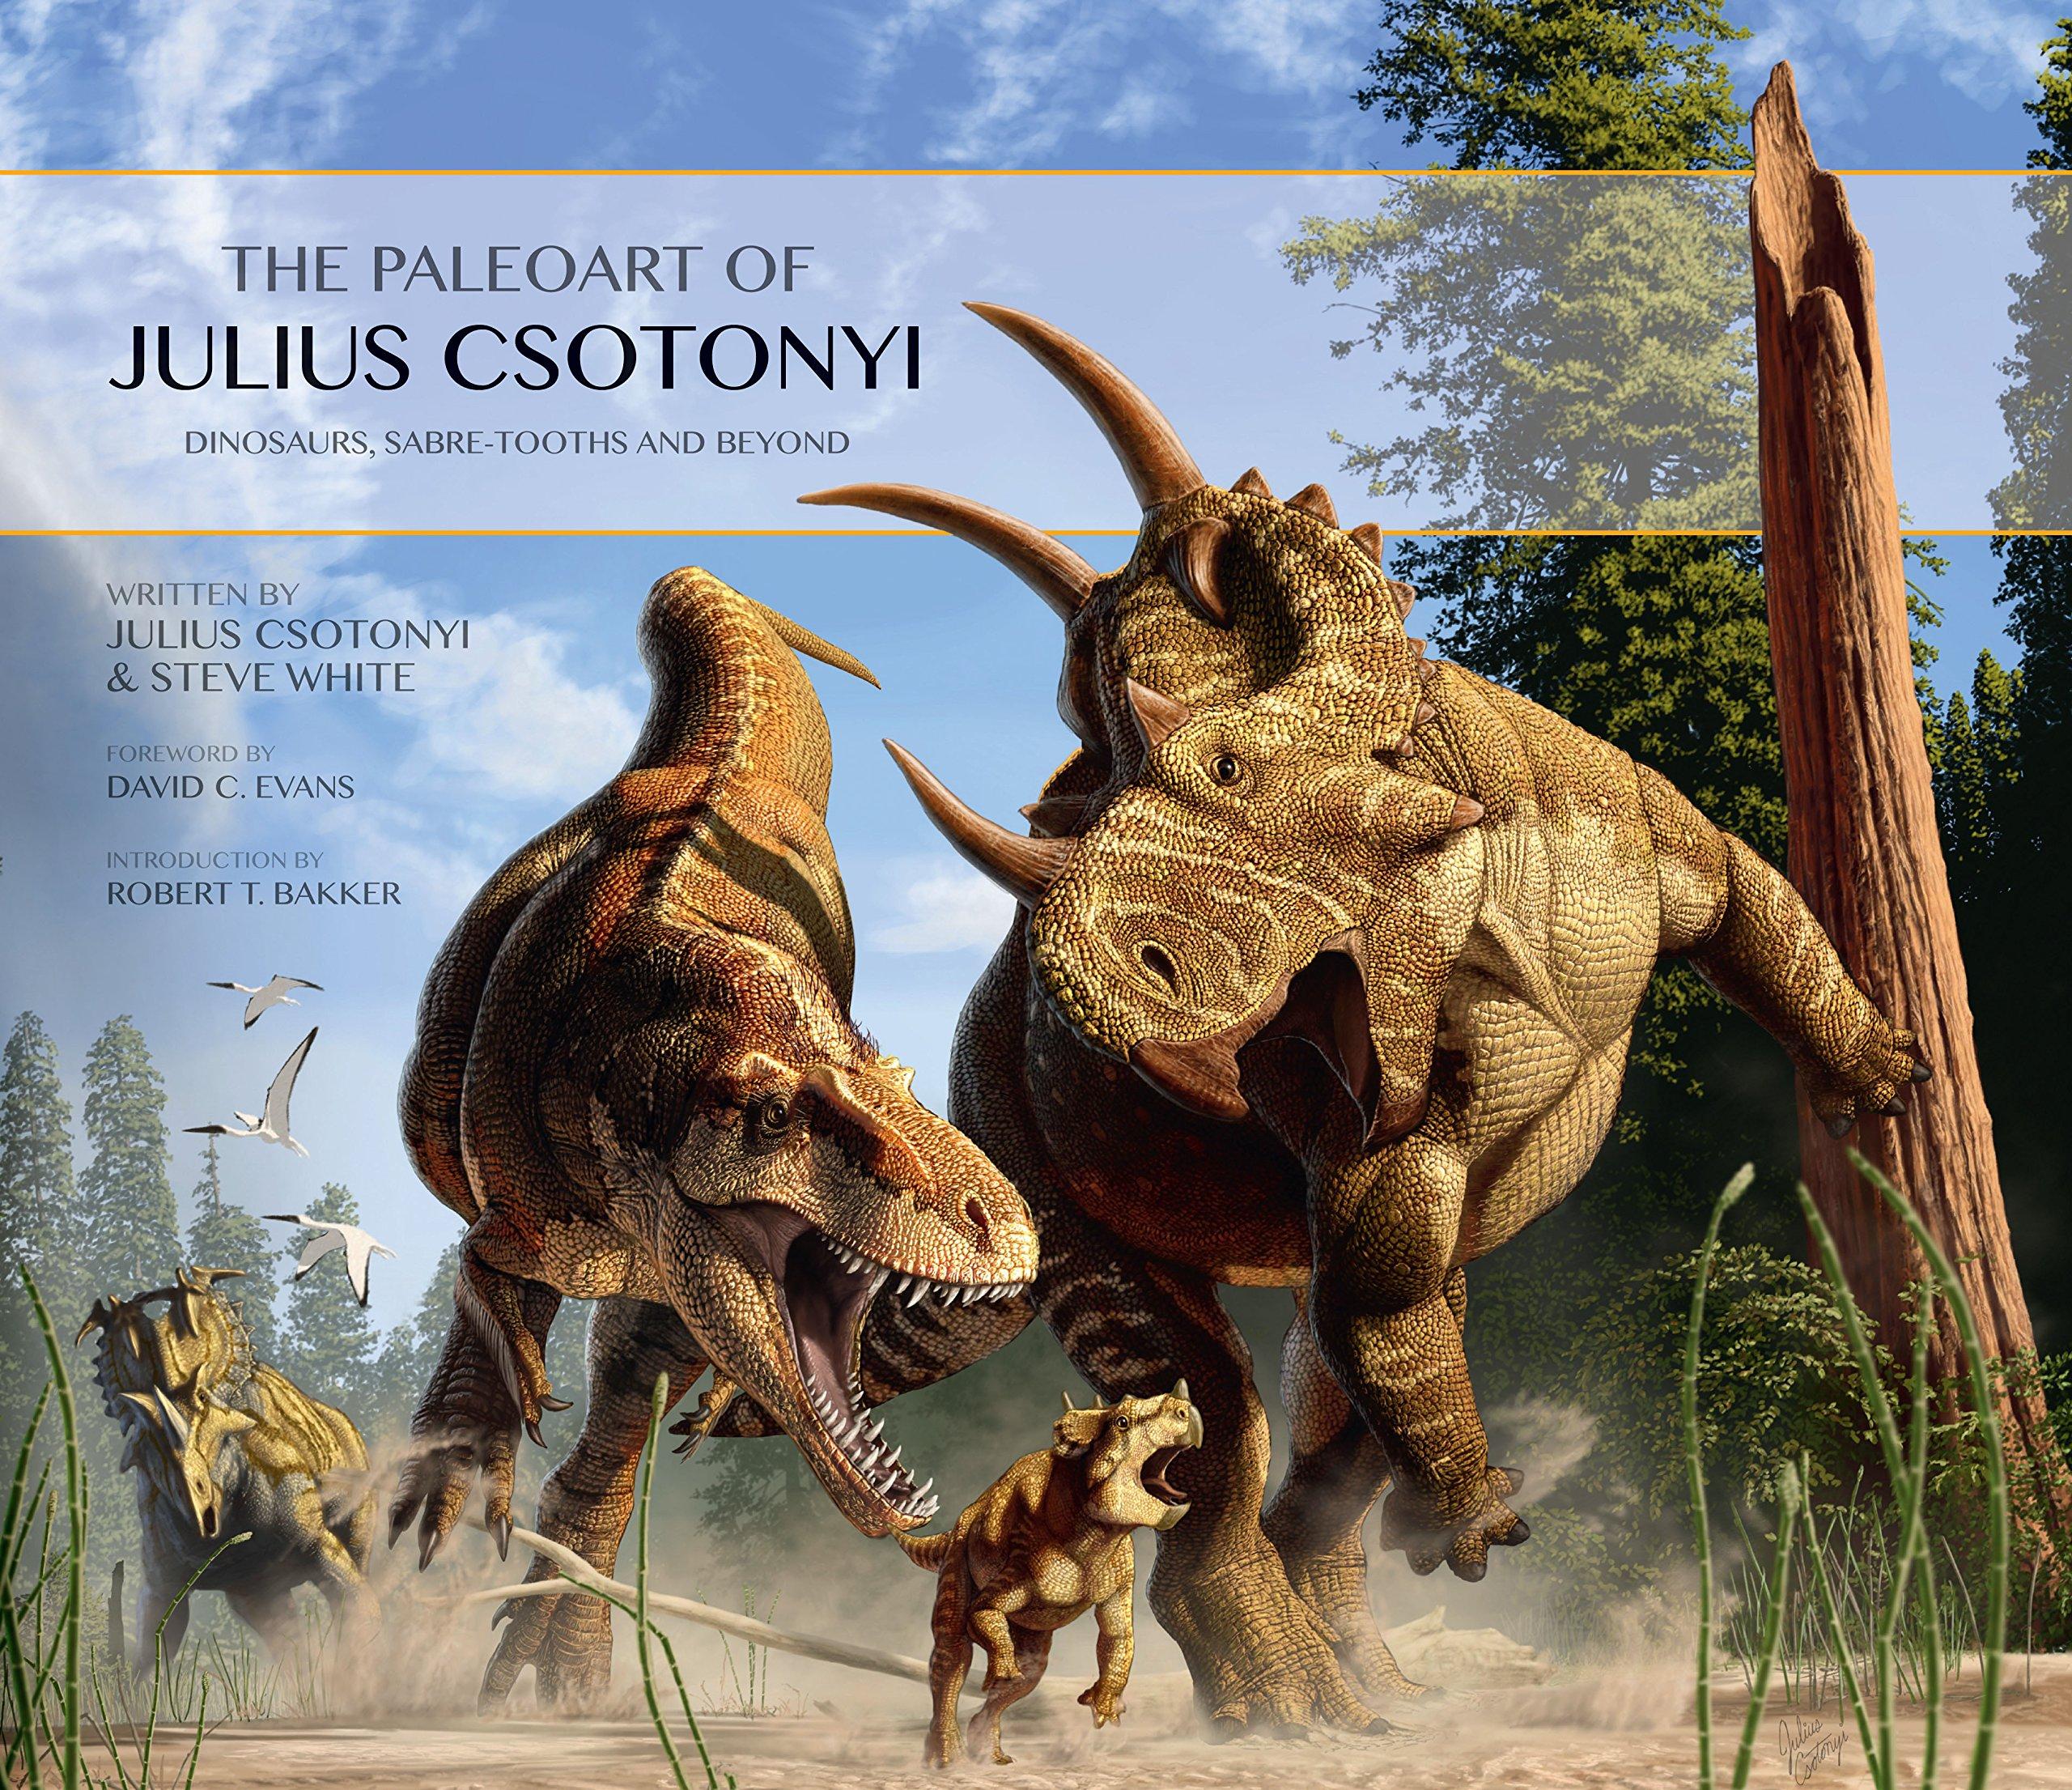 the-paleoart-of-julius-csotonyi